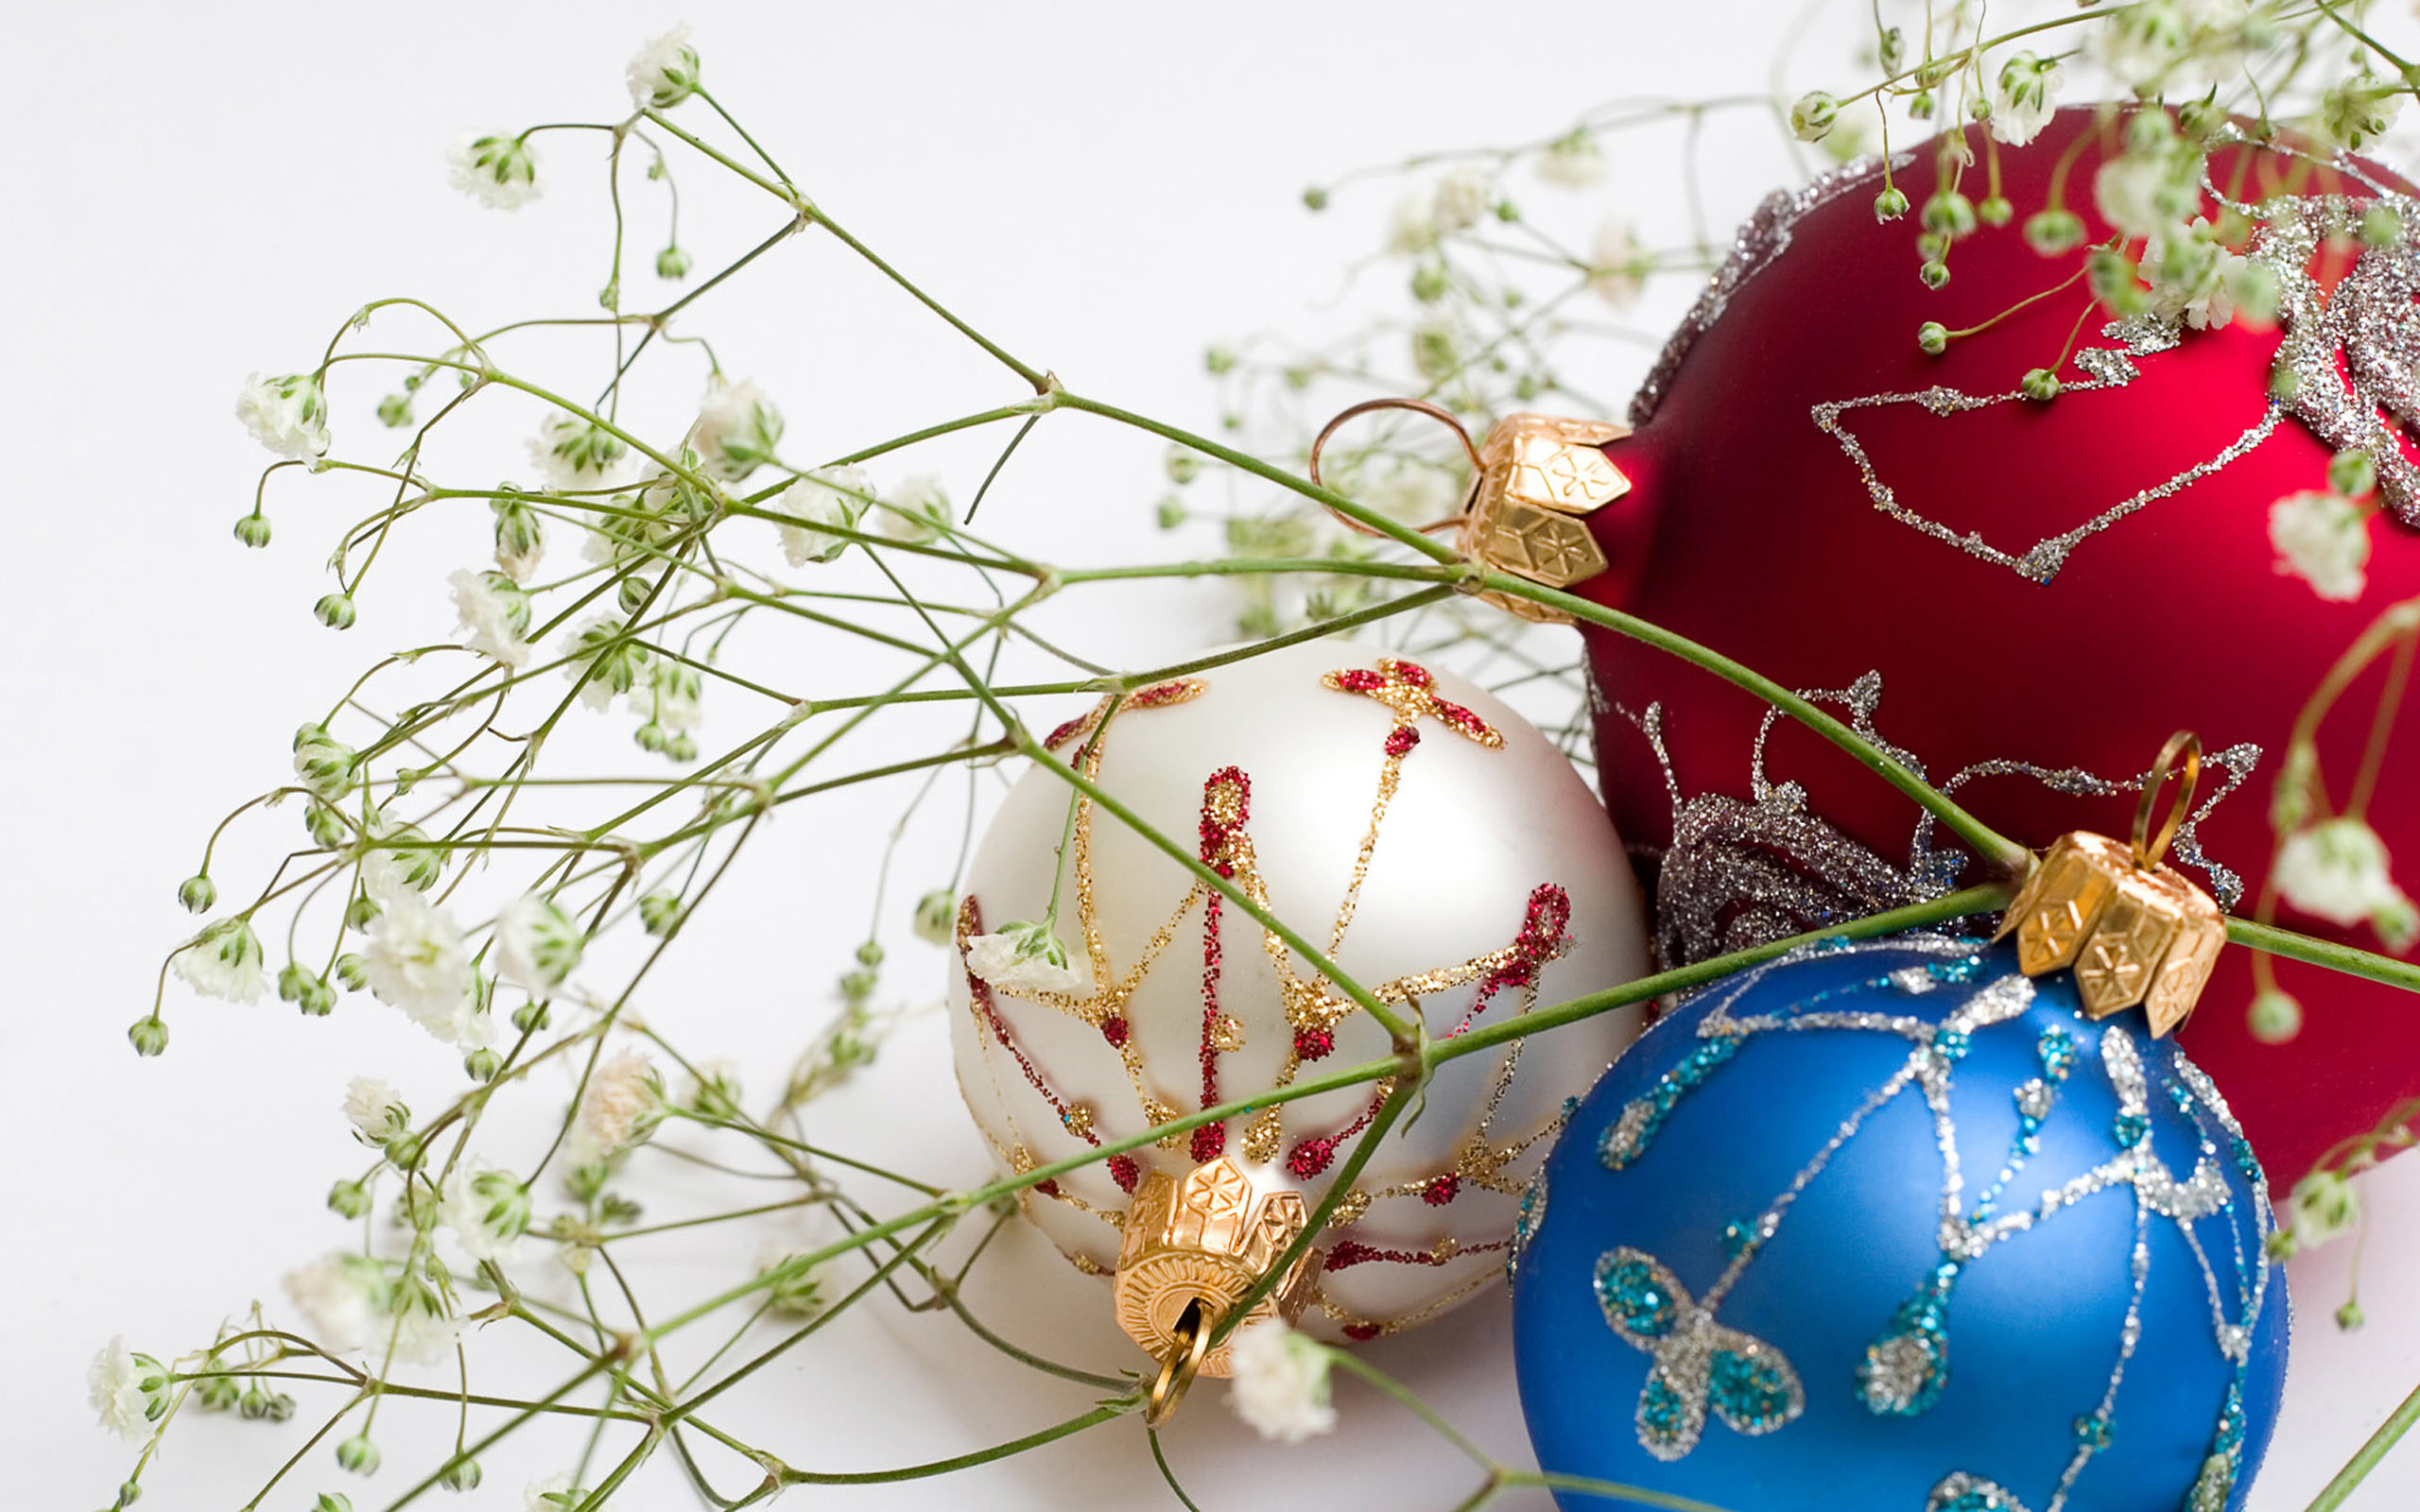 christmas background images christmas desktop wallpaper christmas tree  wallpaper free christmas wallpaper backgrounds merry christmas wallpaper  2016-11-05